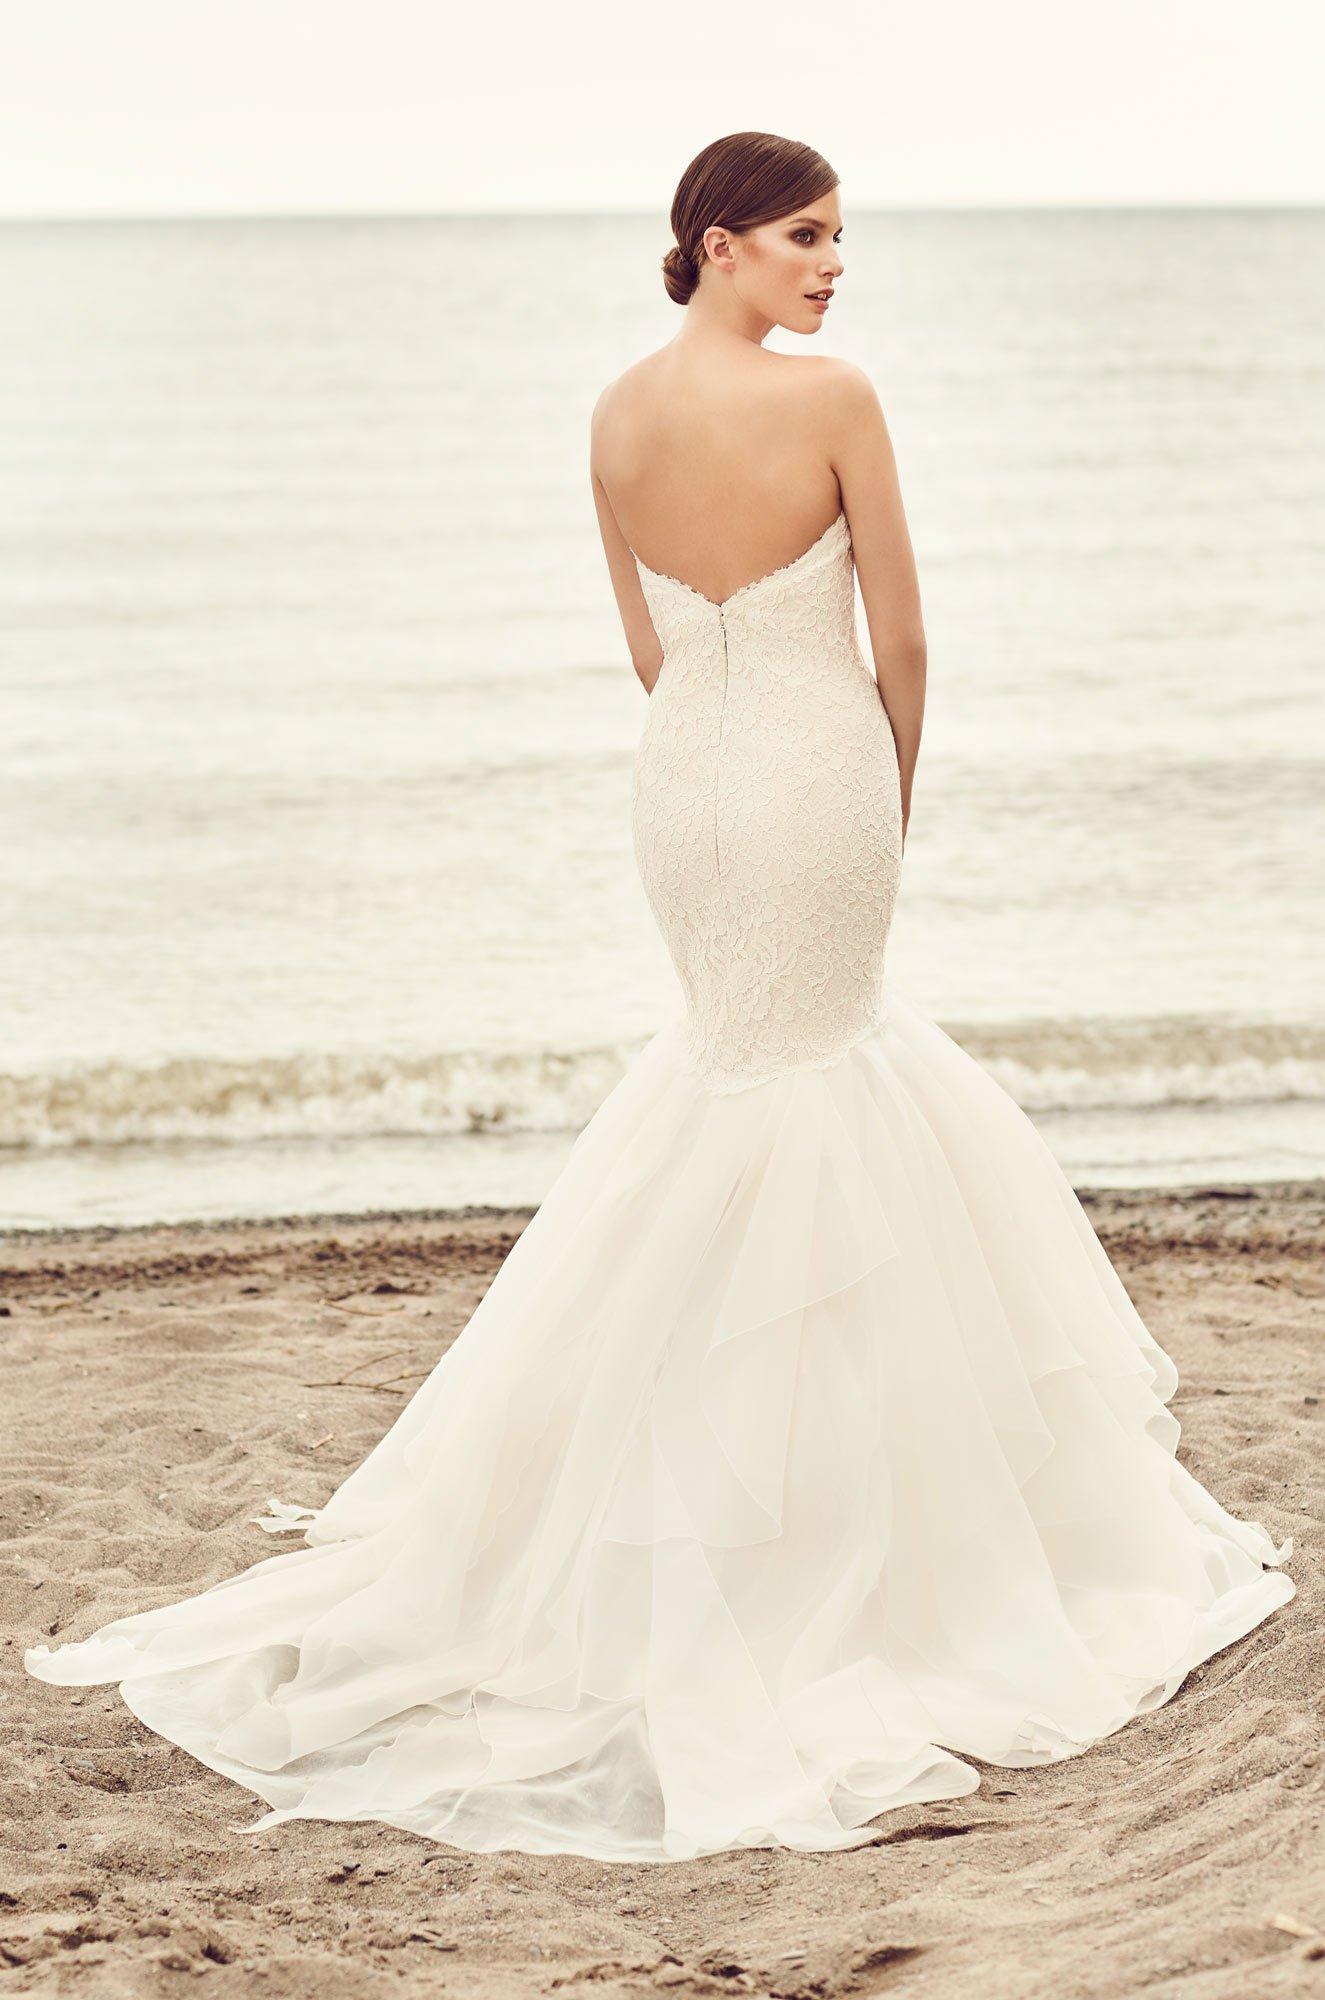 Organza trumpet skirt wedding dress style 2109 for Organza trumpet wedding dress